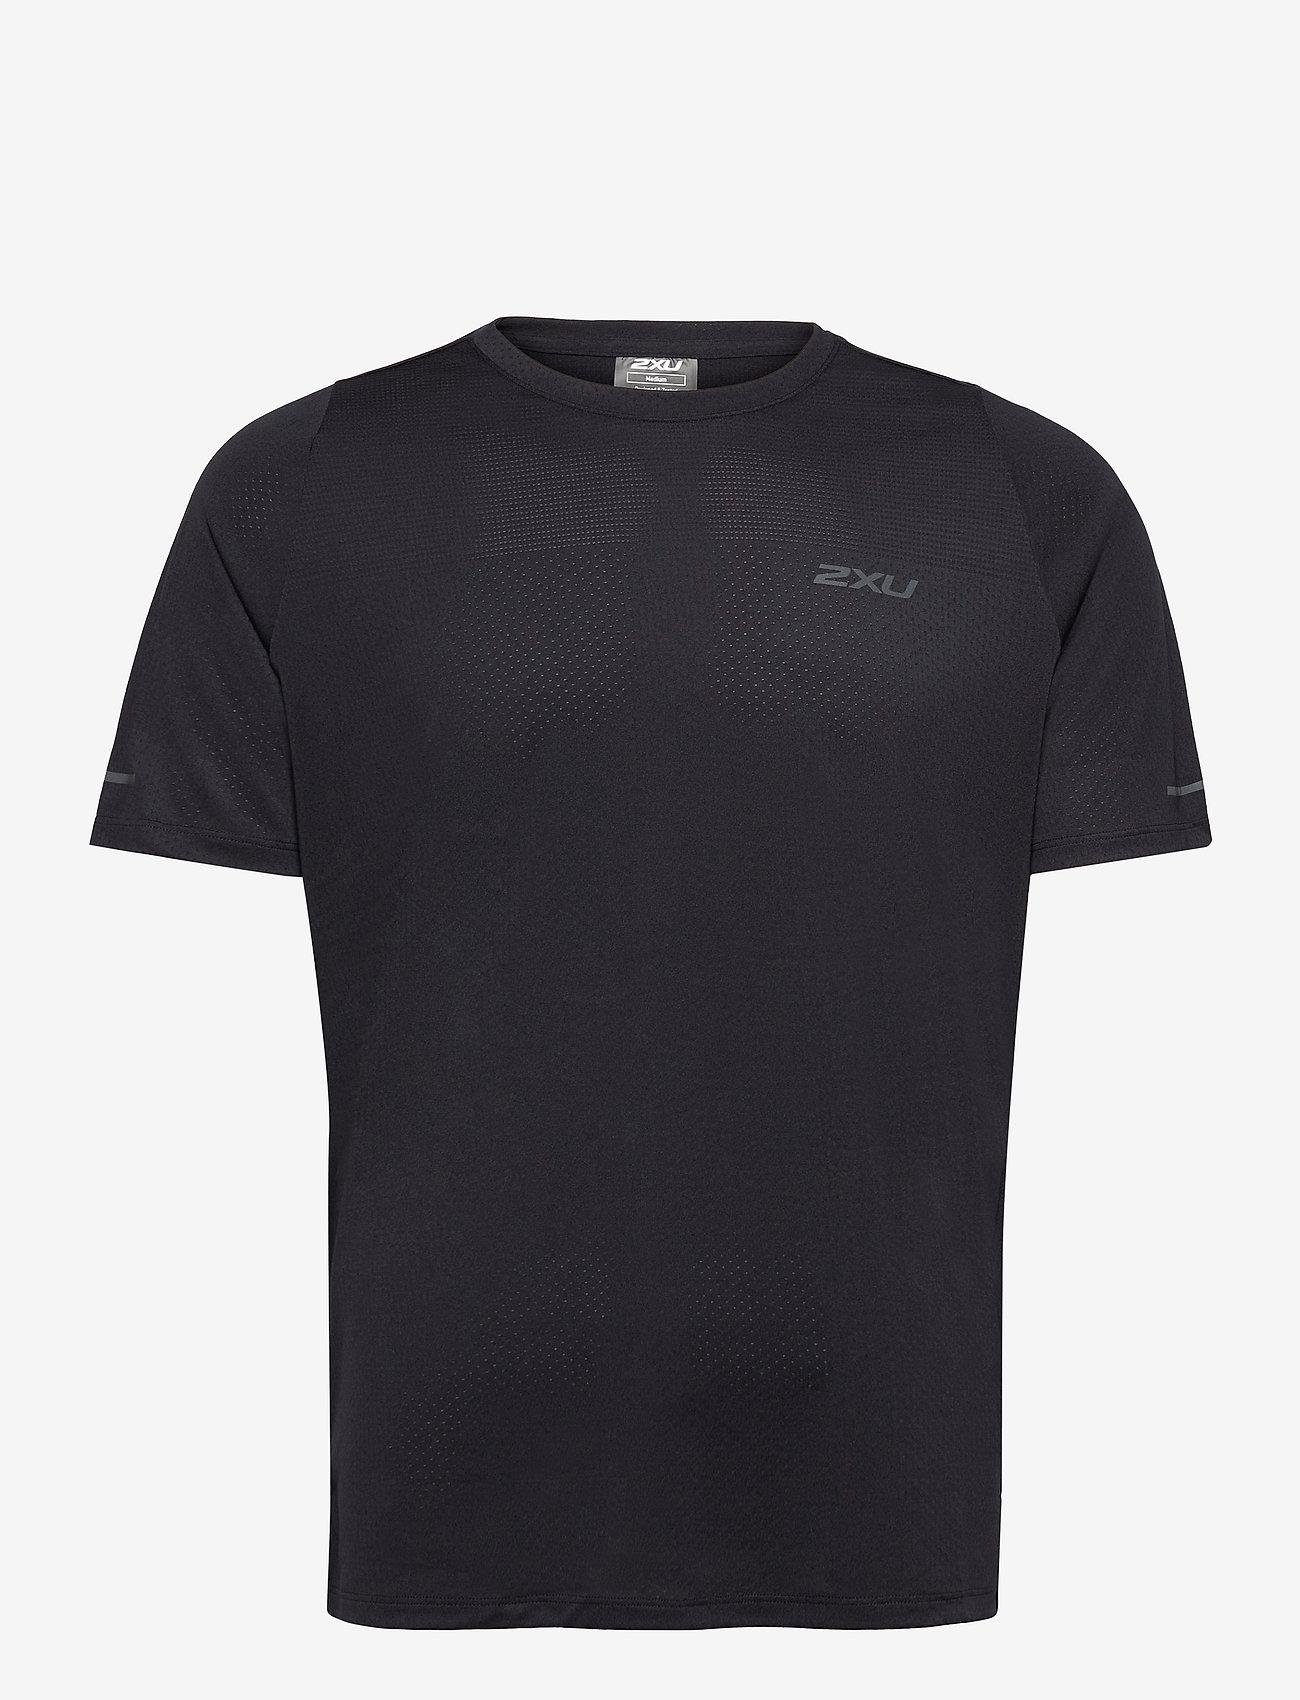 2XU - LIGHT SPEED TECH TEE - t-shirts - black/ black reflective - 0